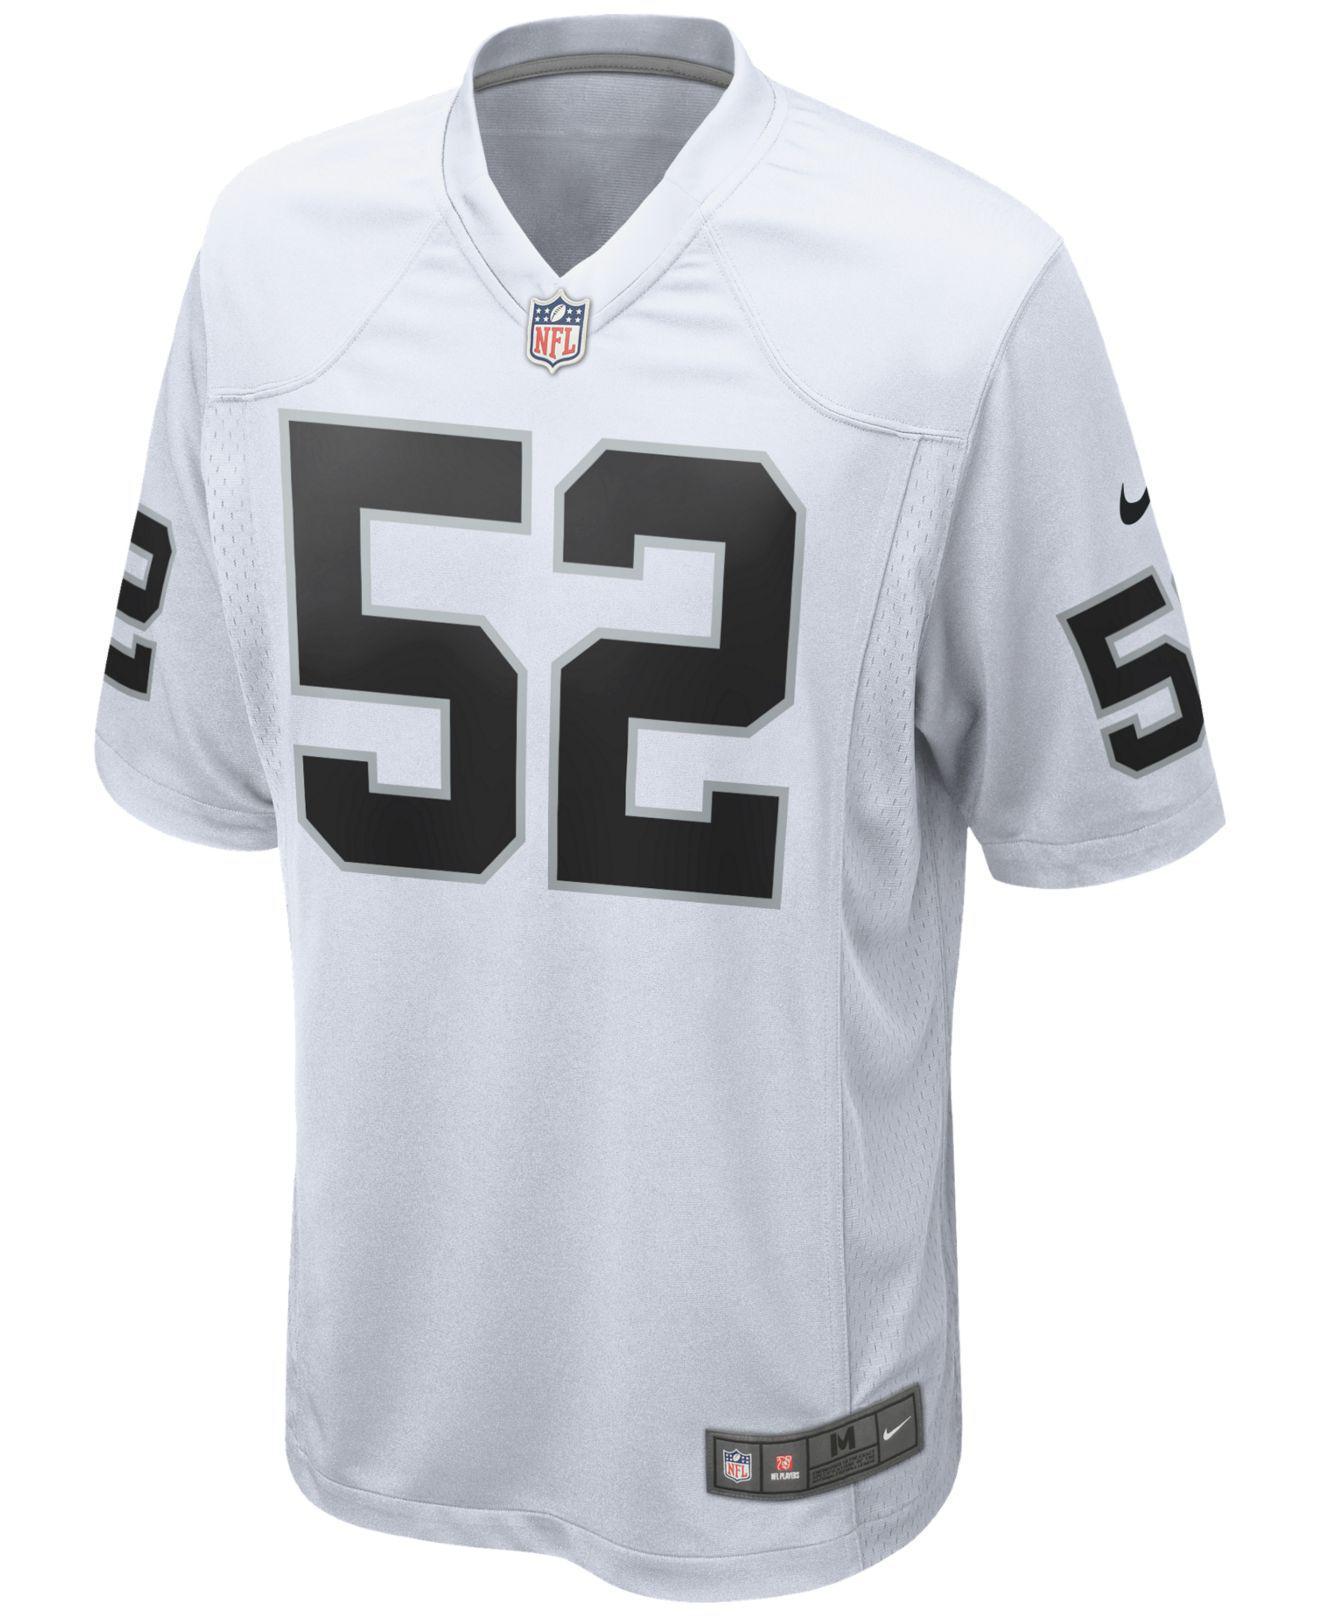 6b50e060045 Lyst - Nike Men S Khalil Mack Oakland Raiders Game Jersey in White for Men  - Save 62%